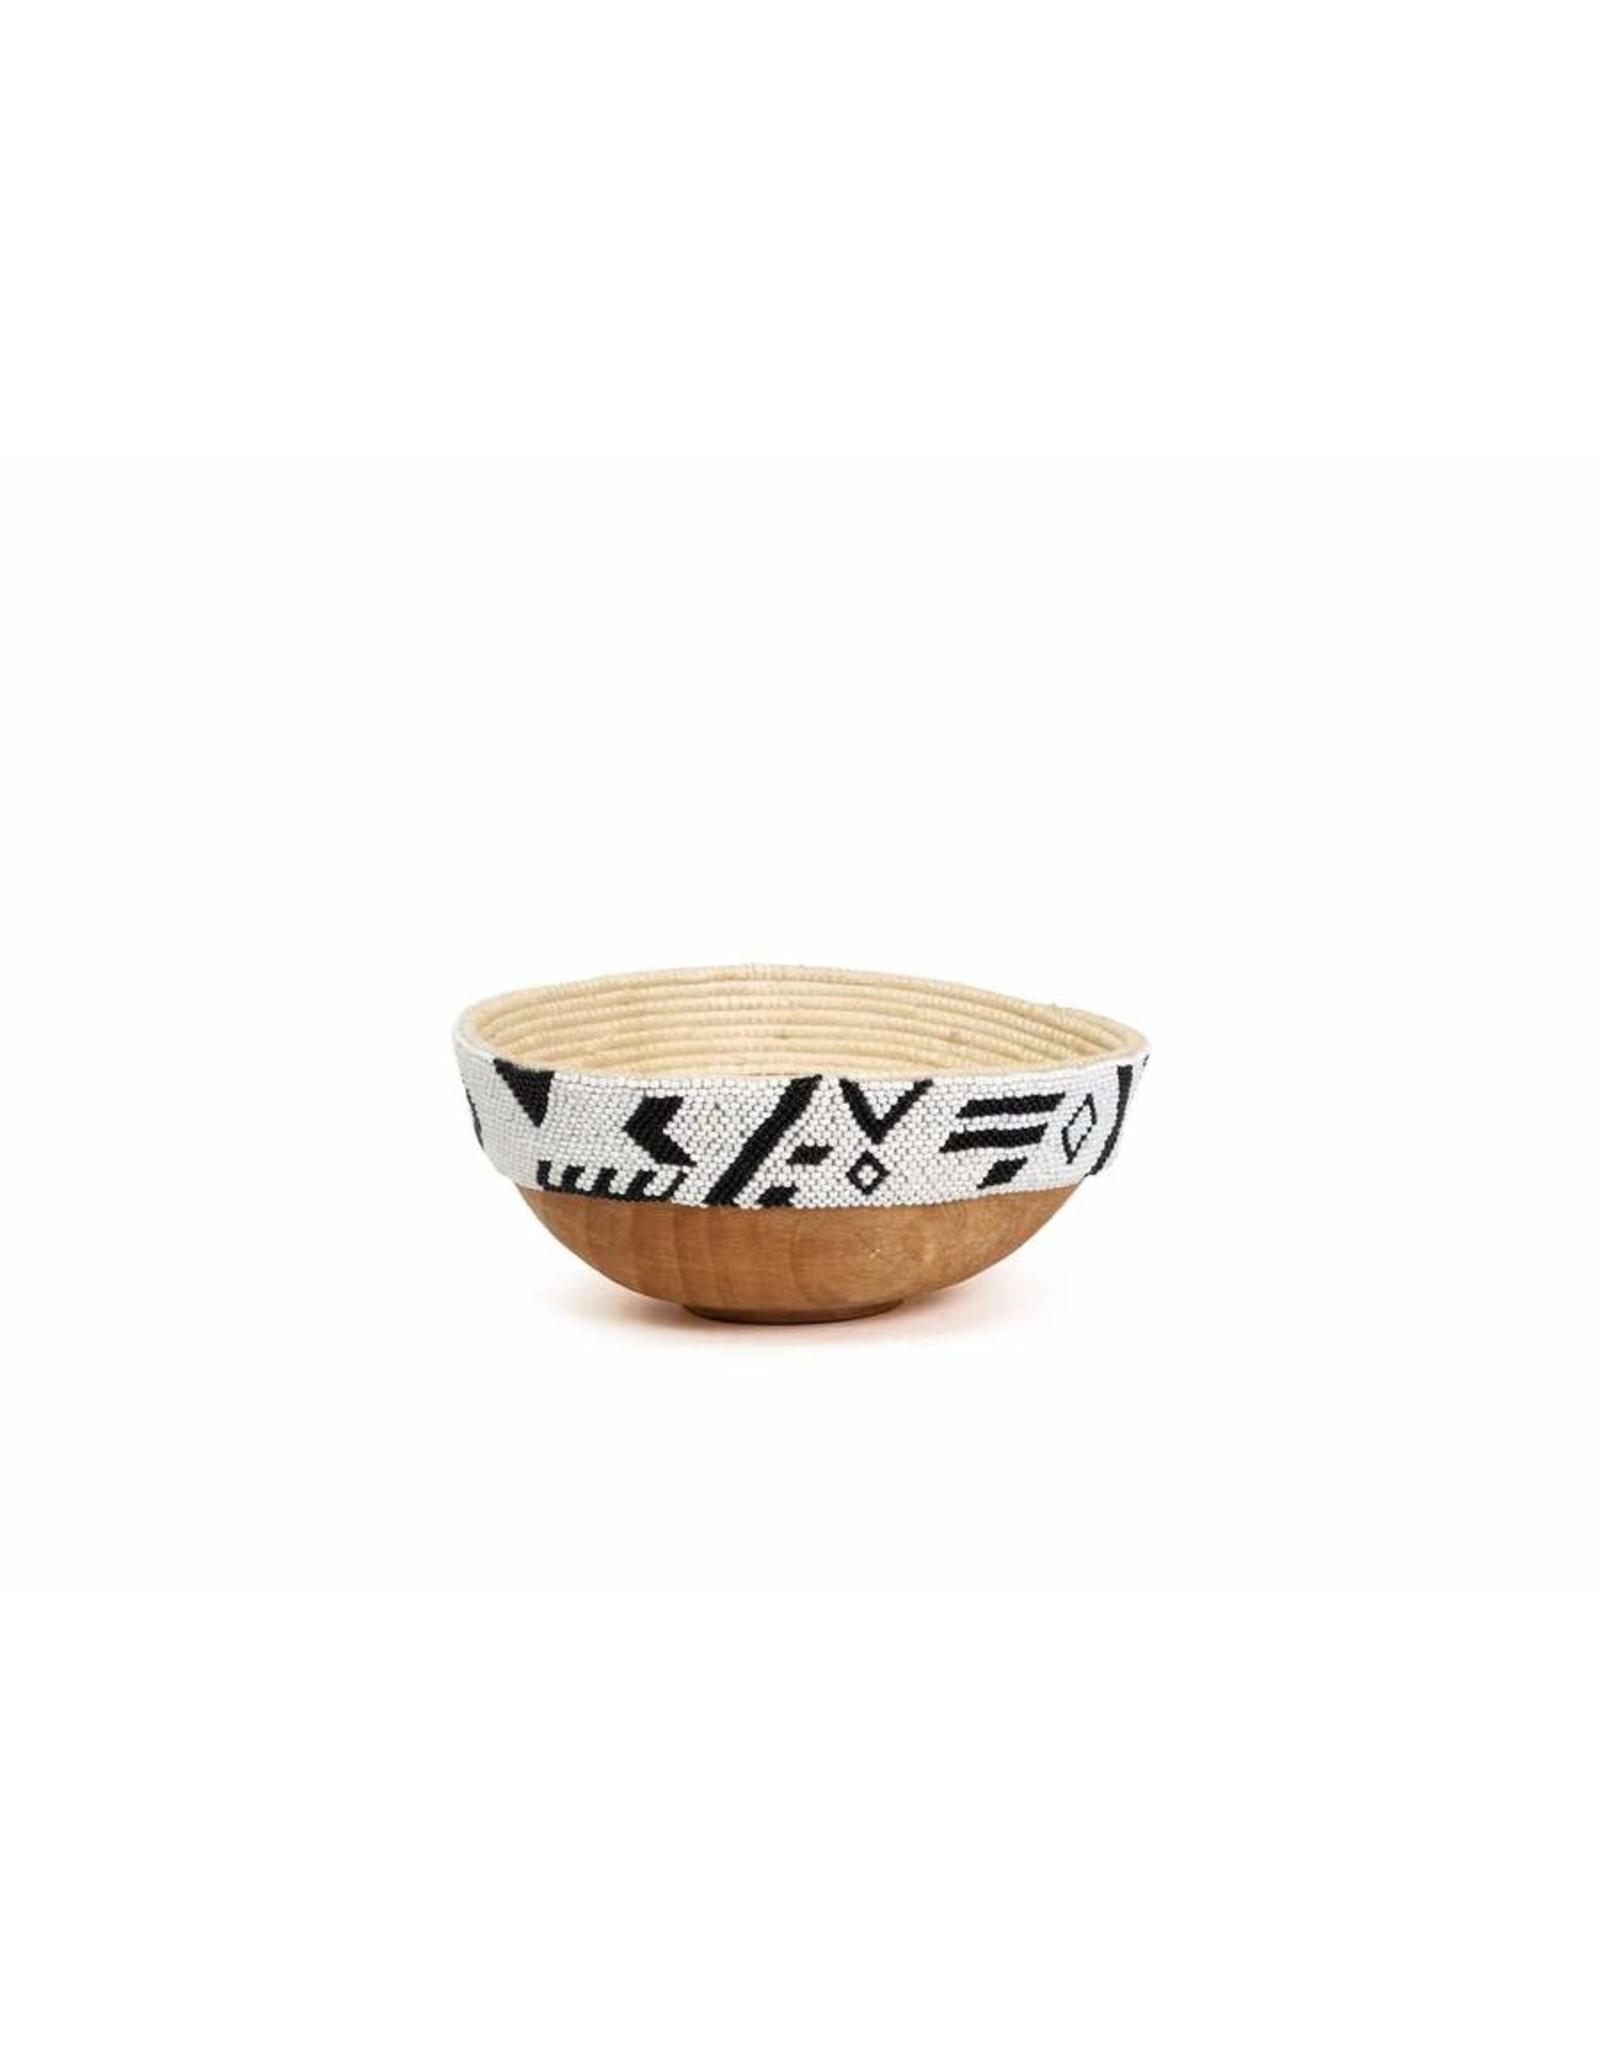 Kazi Black + White Pattern Wooden Bowl Large